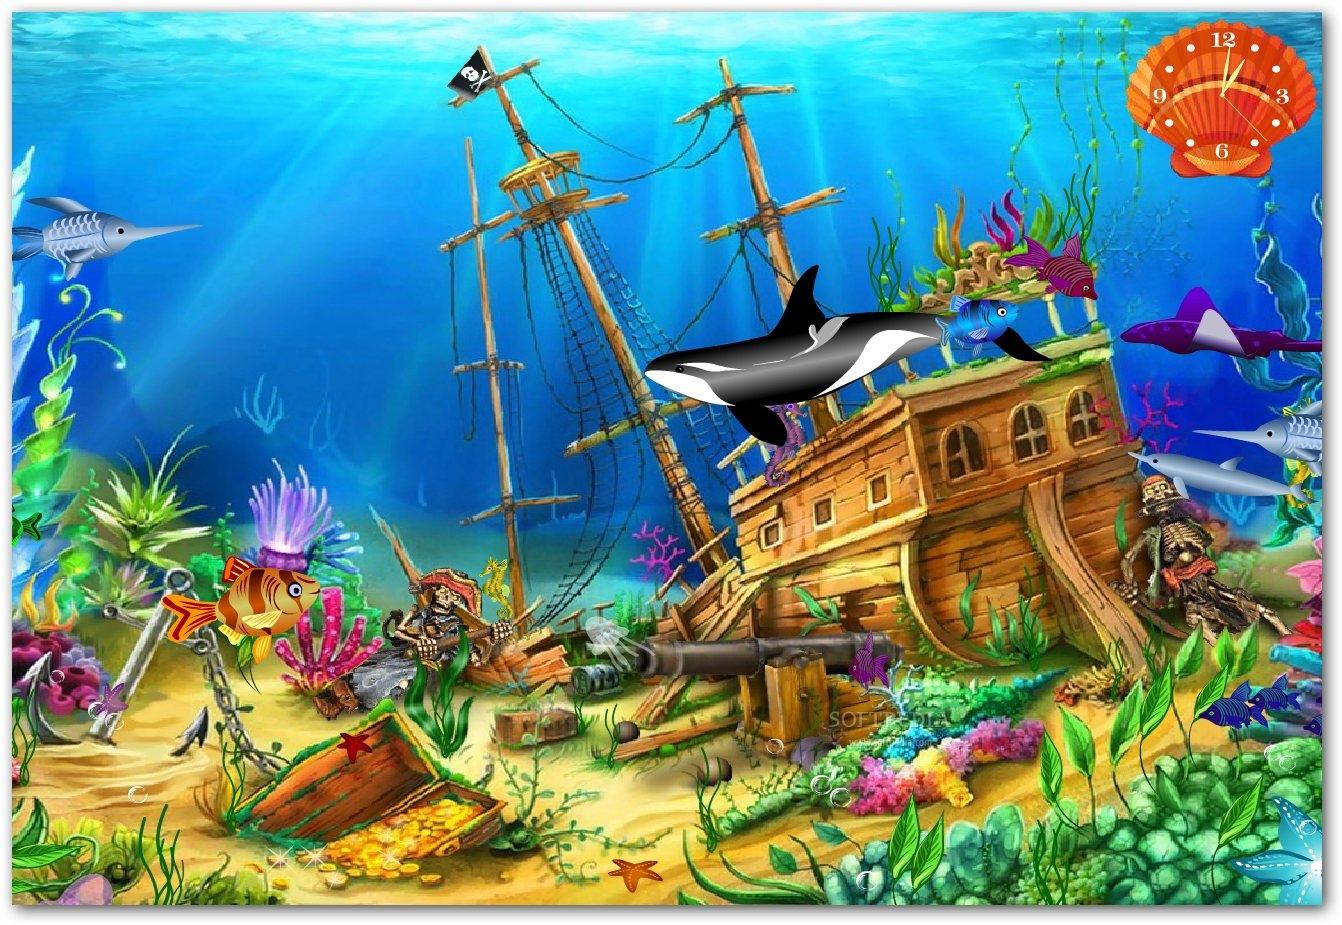 download pirates galleon screensaver 1 0